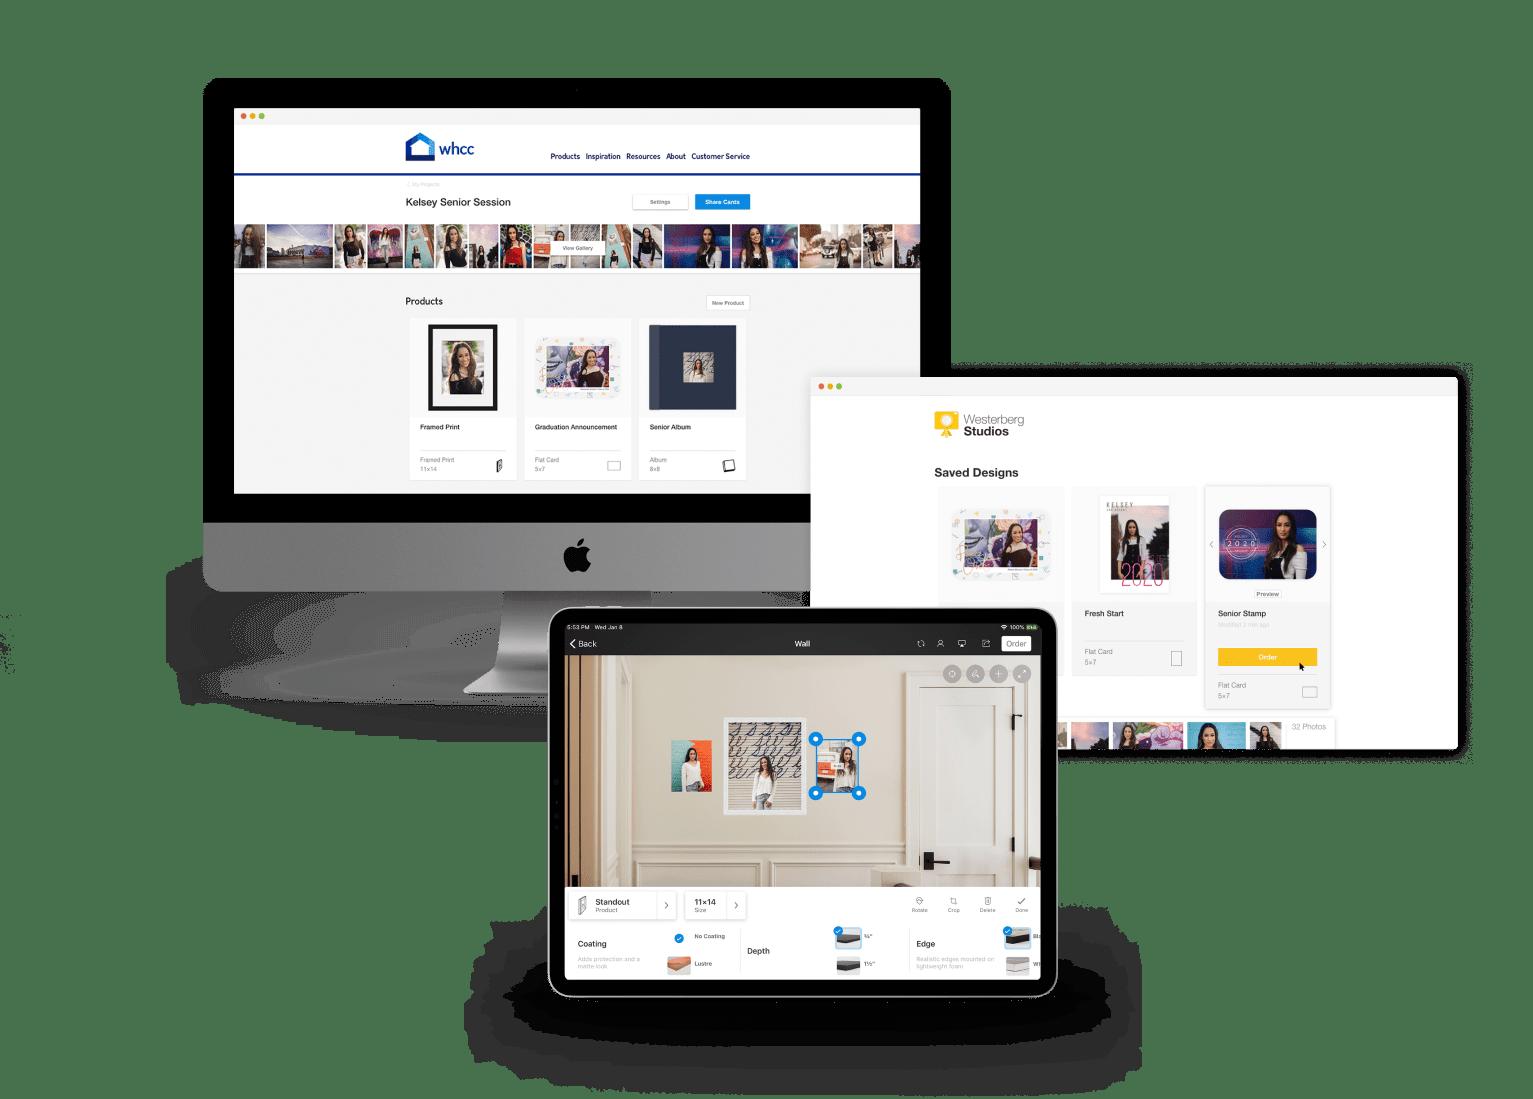 Mockup of Studio App on Desktop computer, browser screen, and iPad.